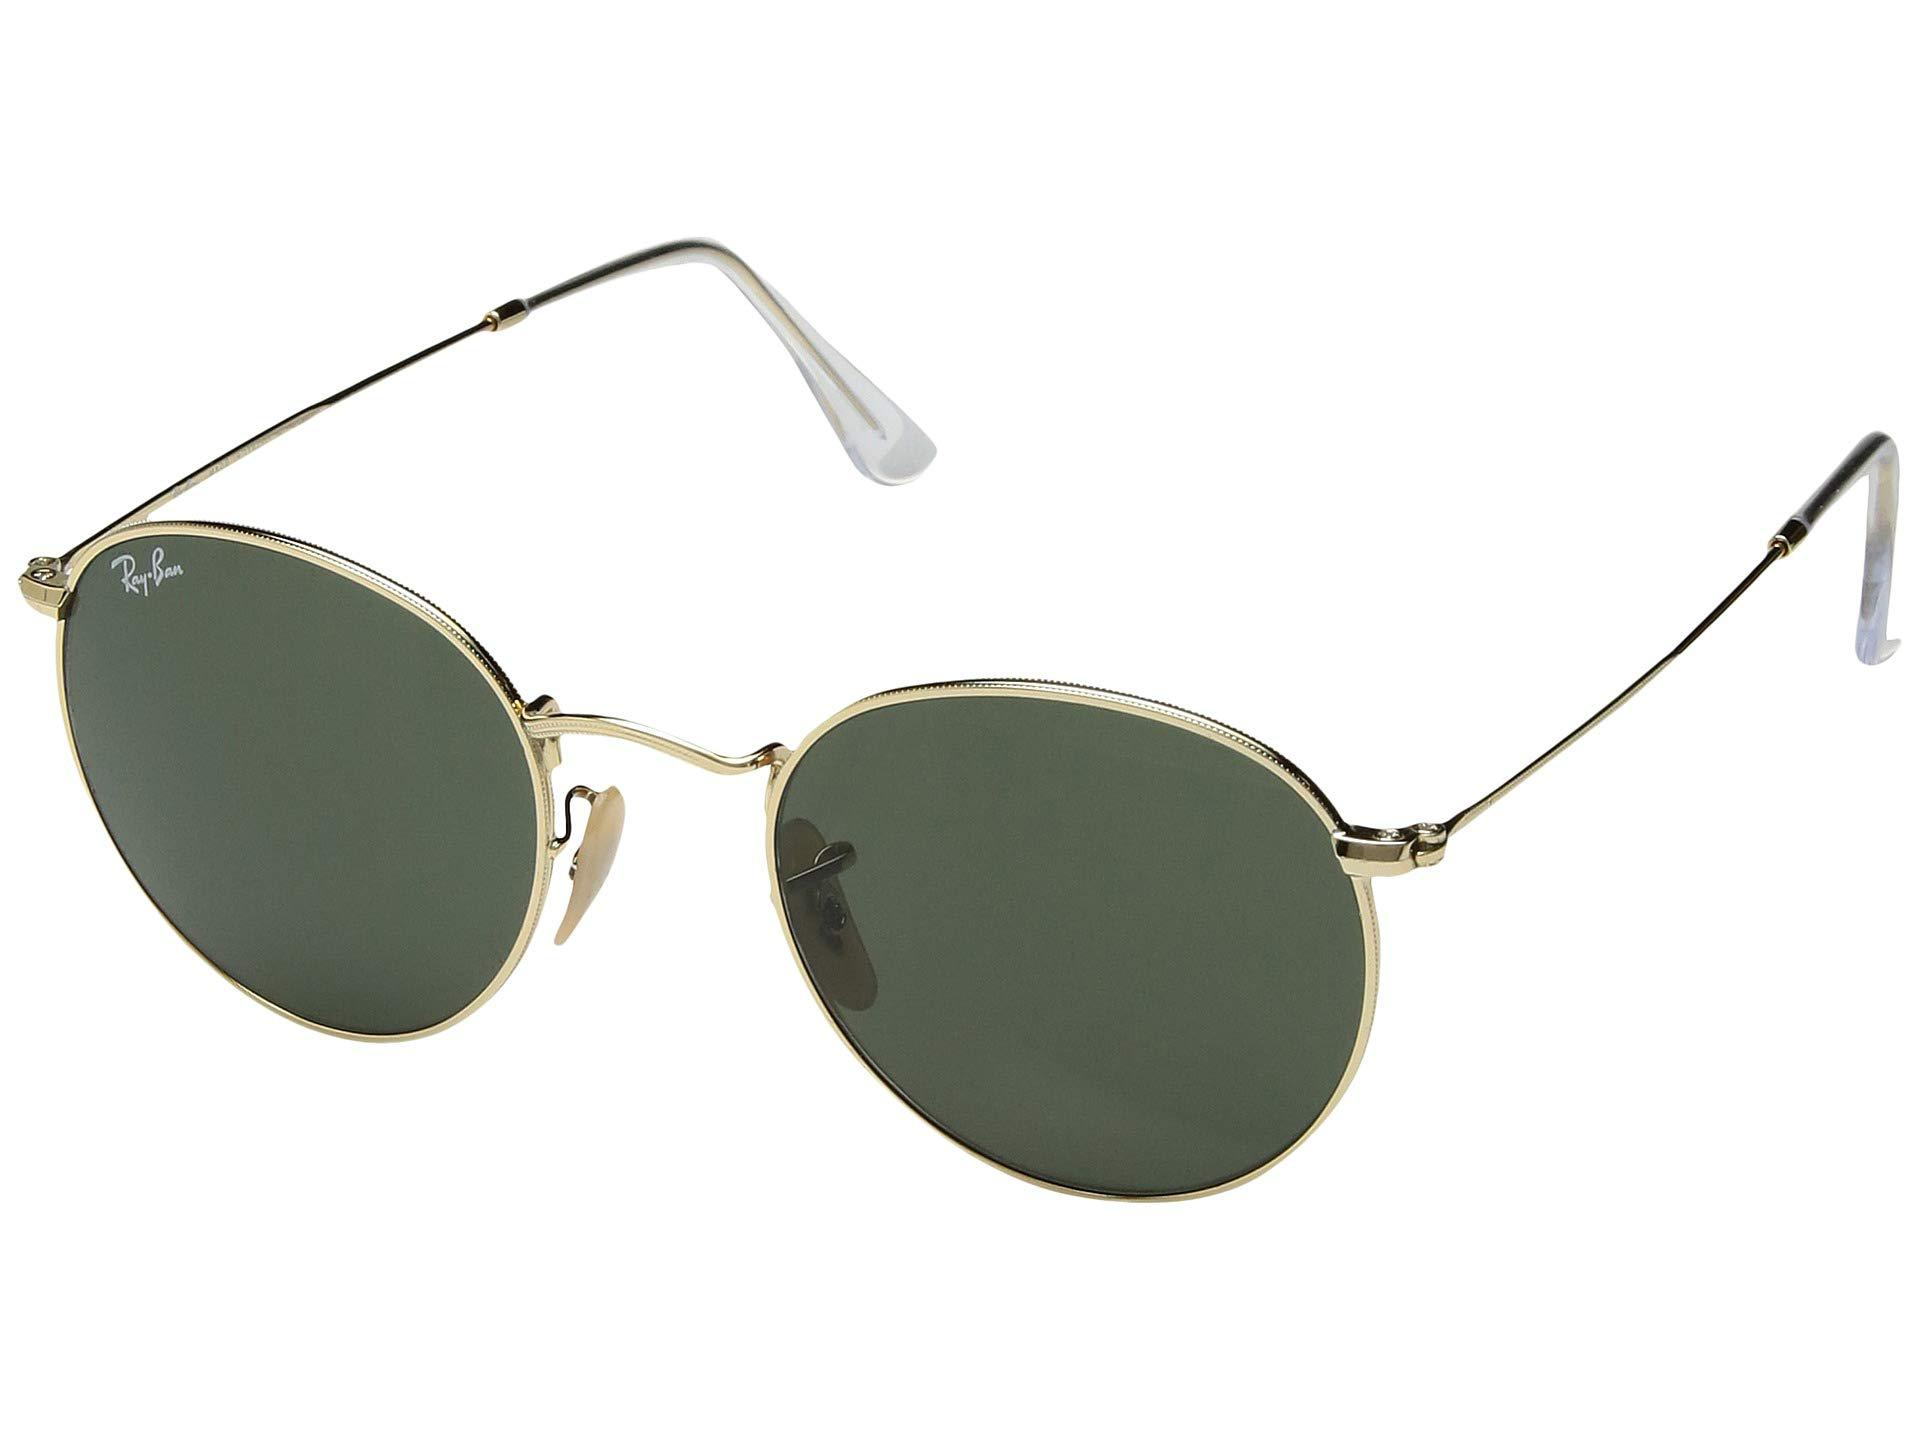 5874b47019e3 Lyst - Ray-Ban 0rb3447 Round Metal 50mm (gold green) Fashion ...